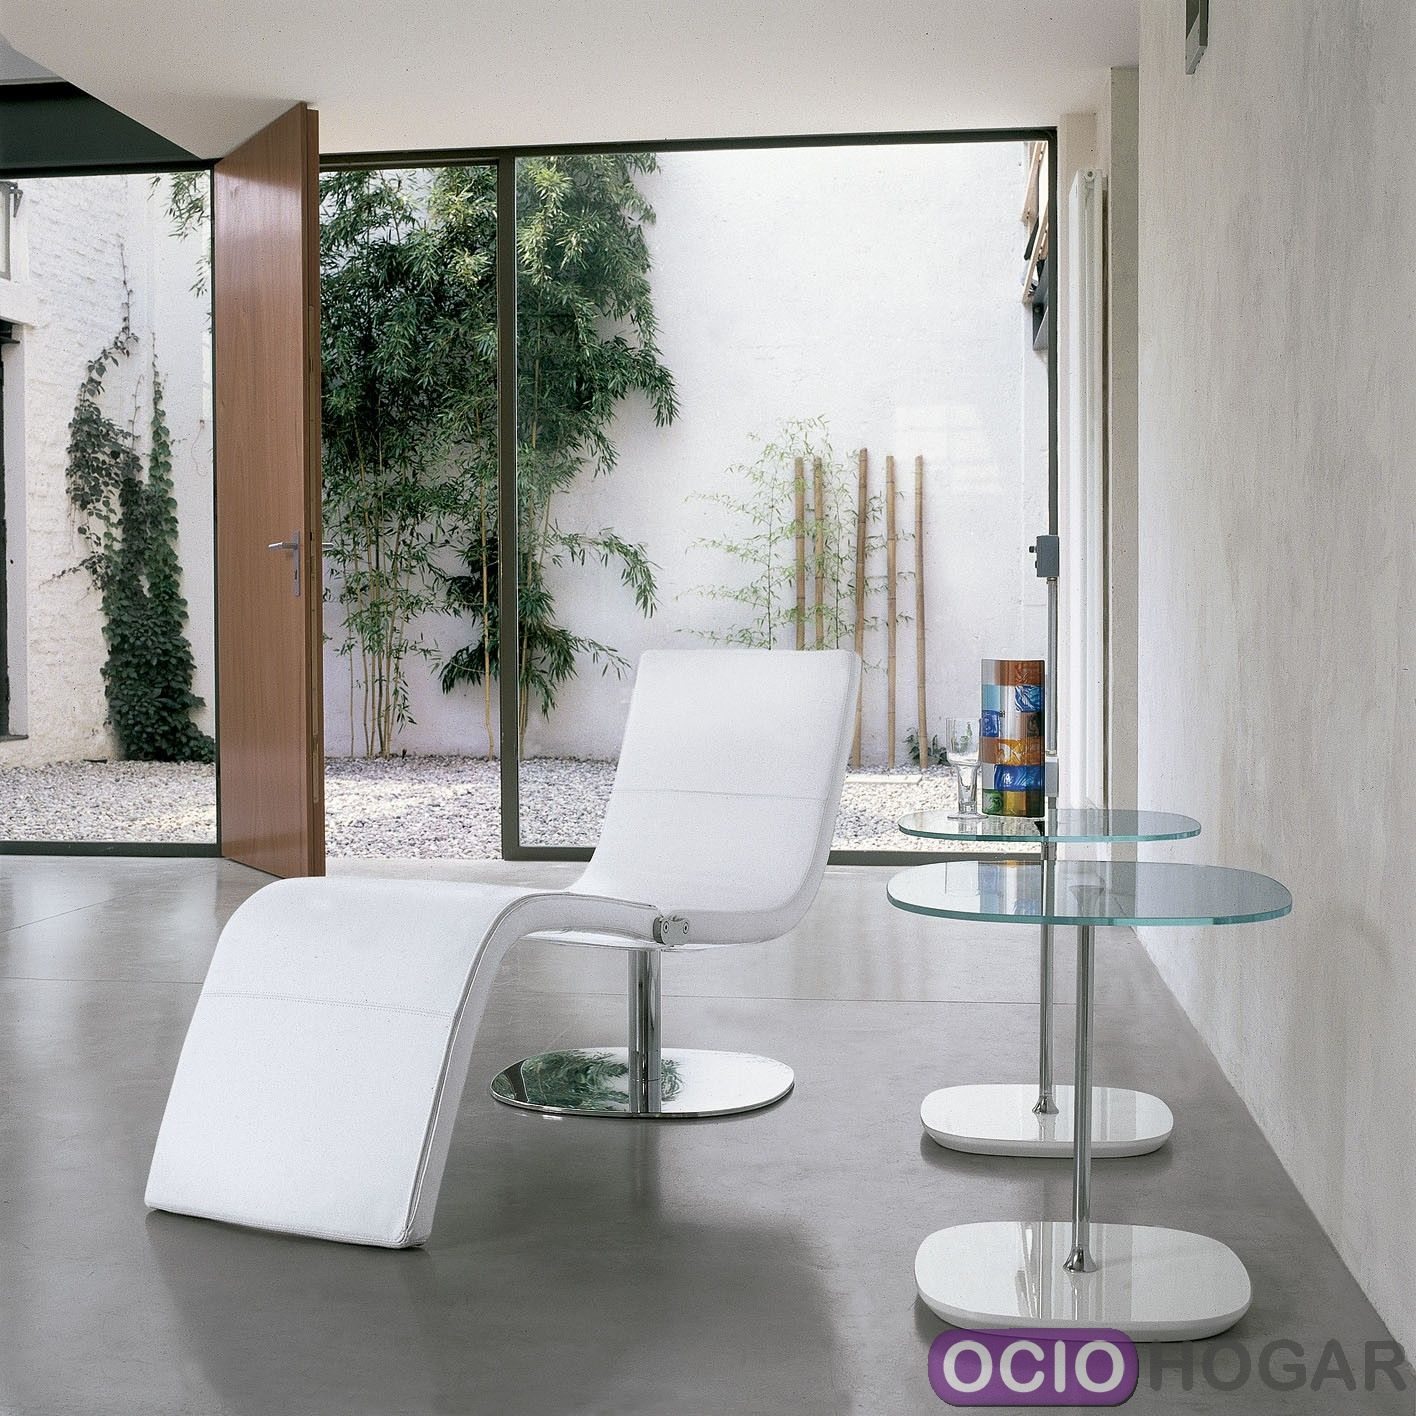 Comprar butaca chaise longue dragonfly de bonaldo piel - Butaca chaise longue ...